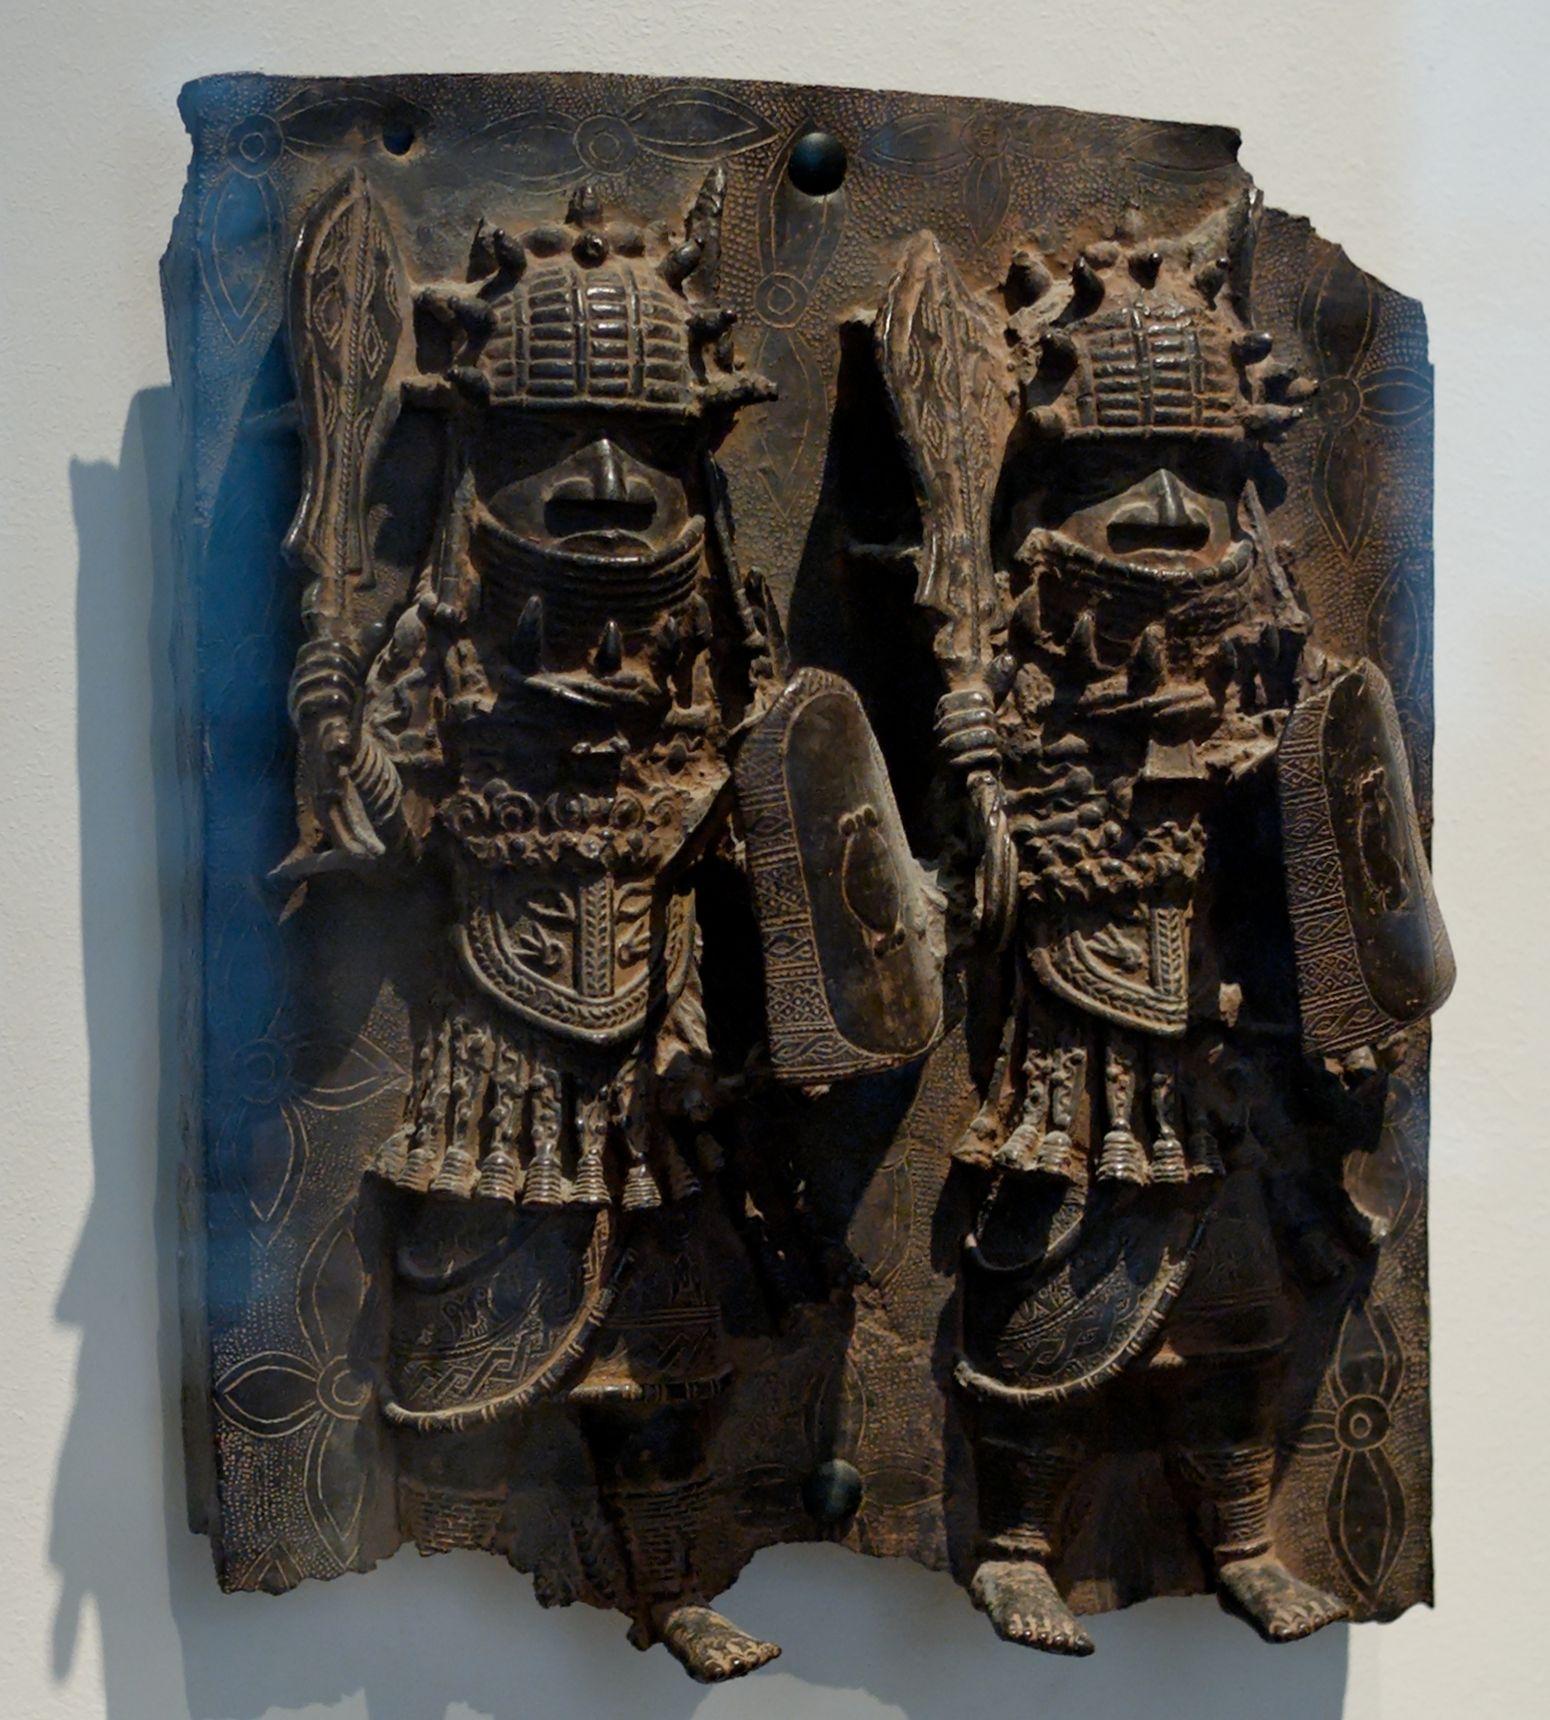 Umetnost naroda Afrike 54657